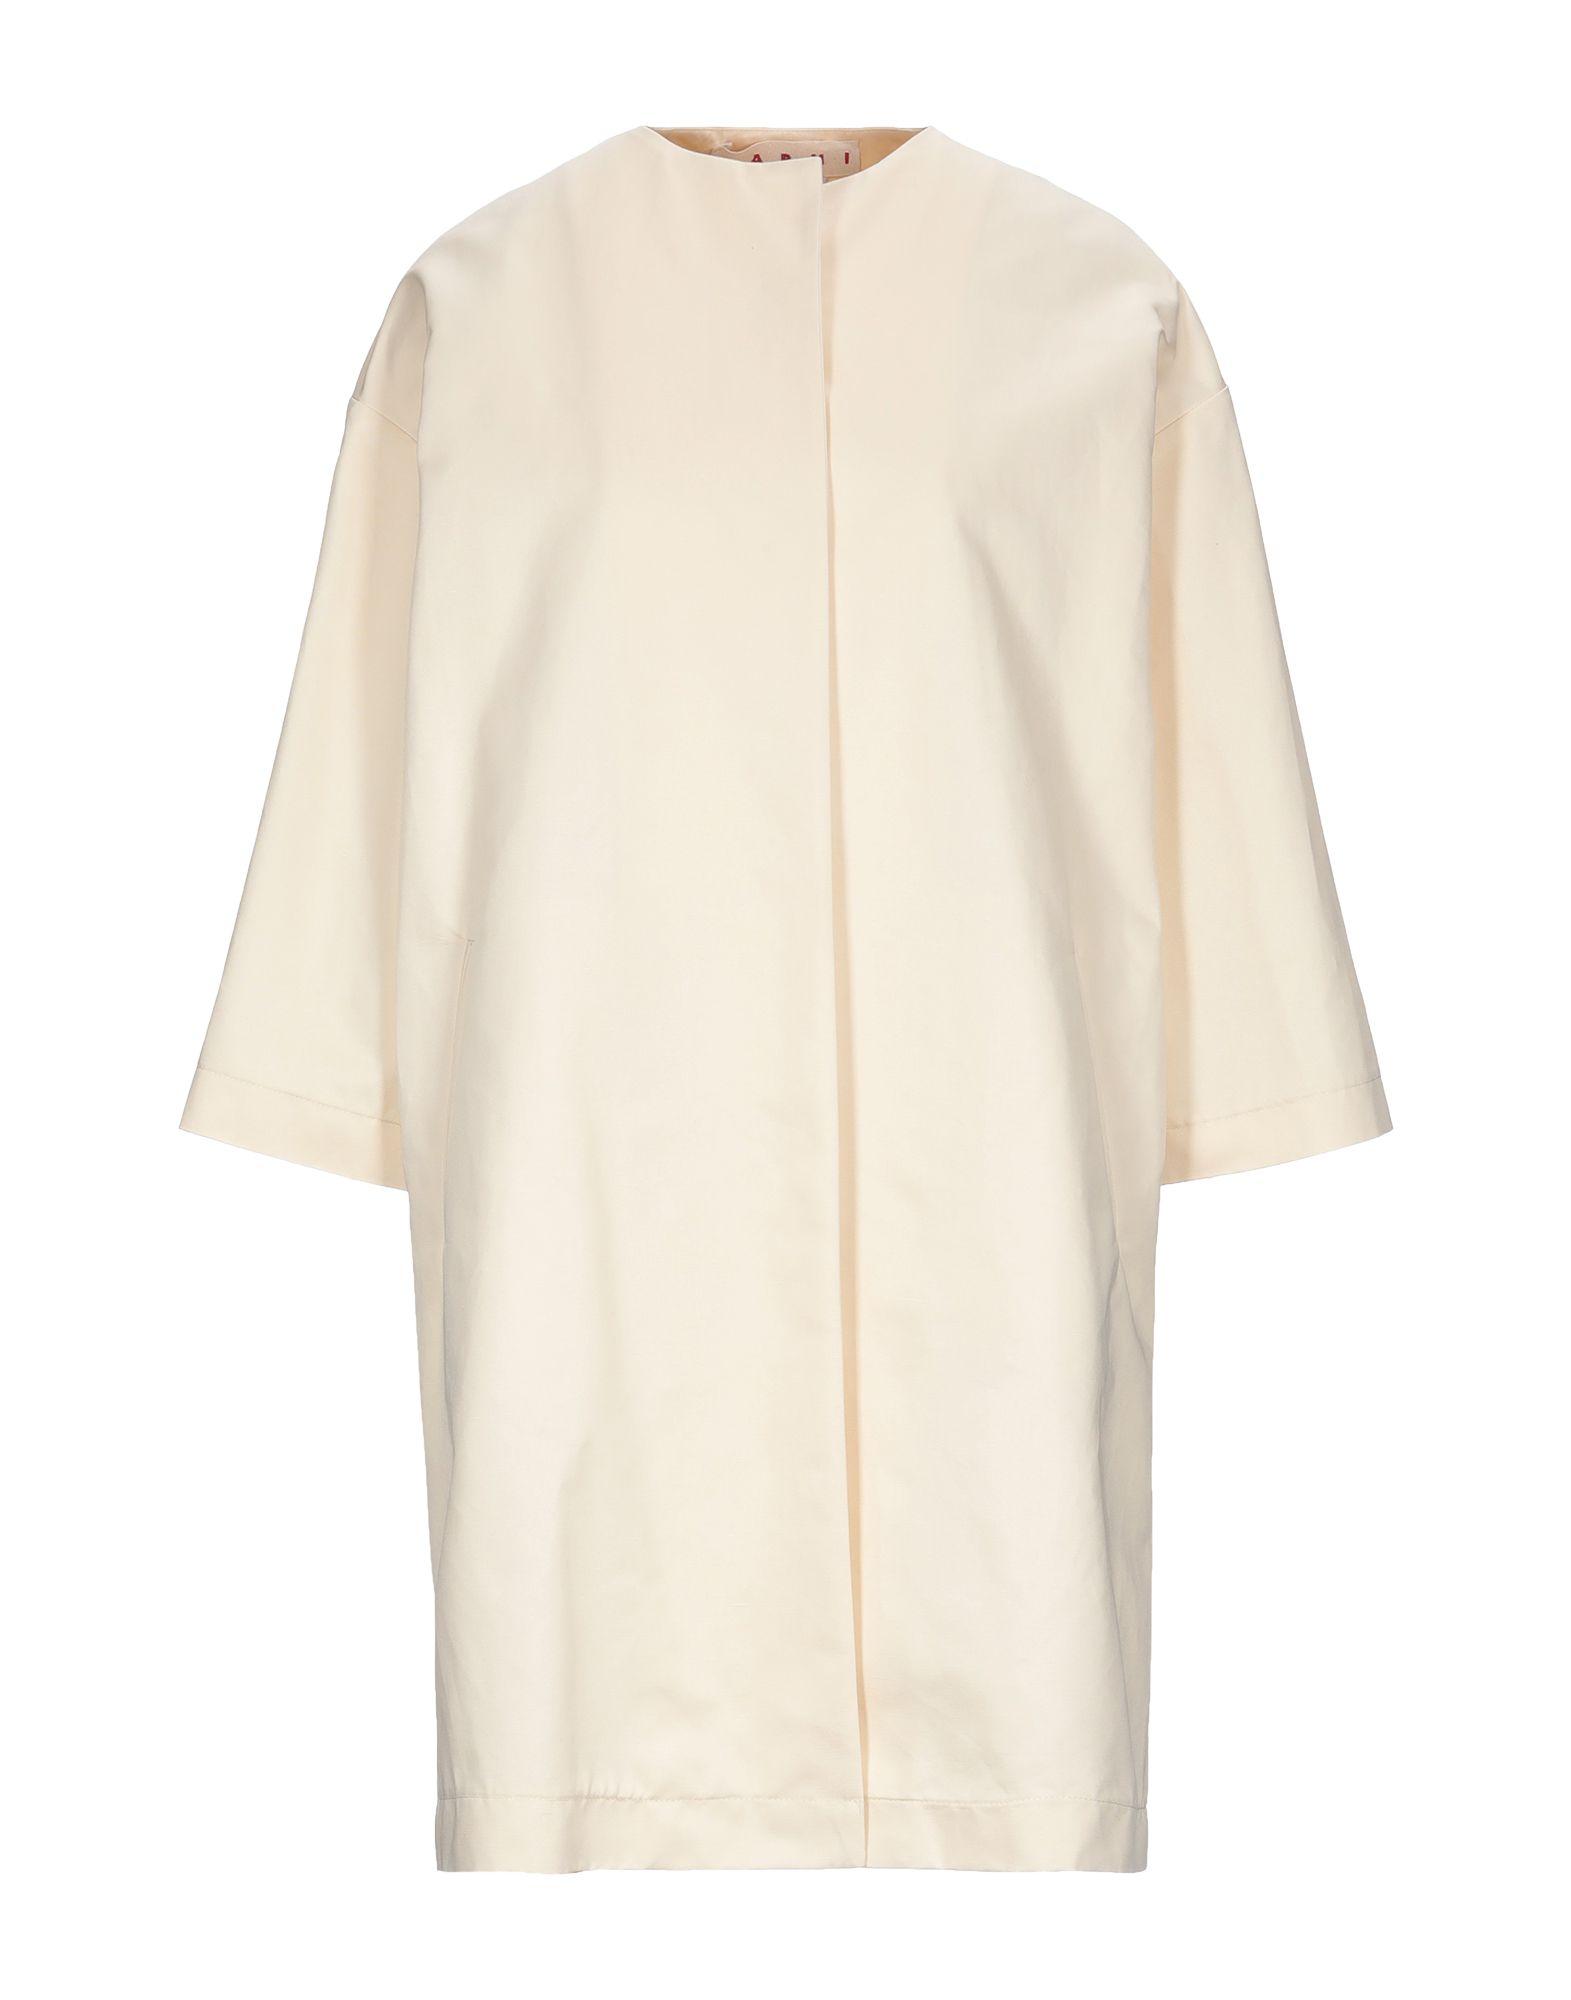 MARNI Overcoats. gabardine, no appliqués, single-breasted, basic solid color, deep neckline, multipockets, long sleeves, unlined. 77% Cotton, 23% Linen